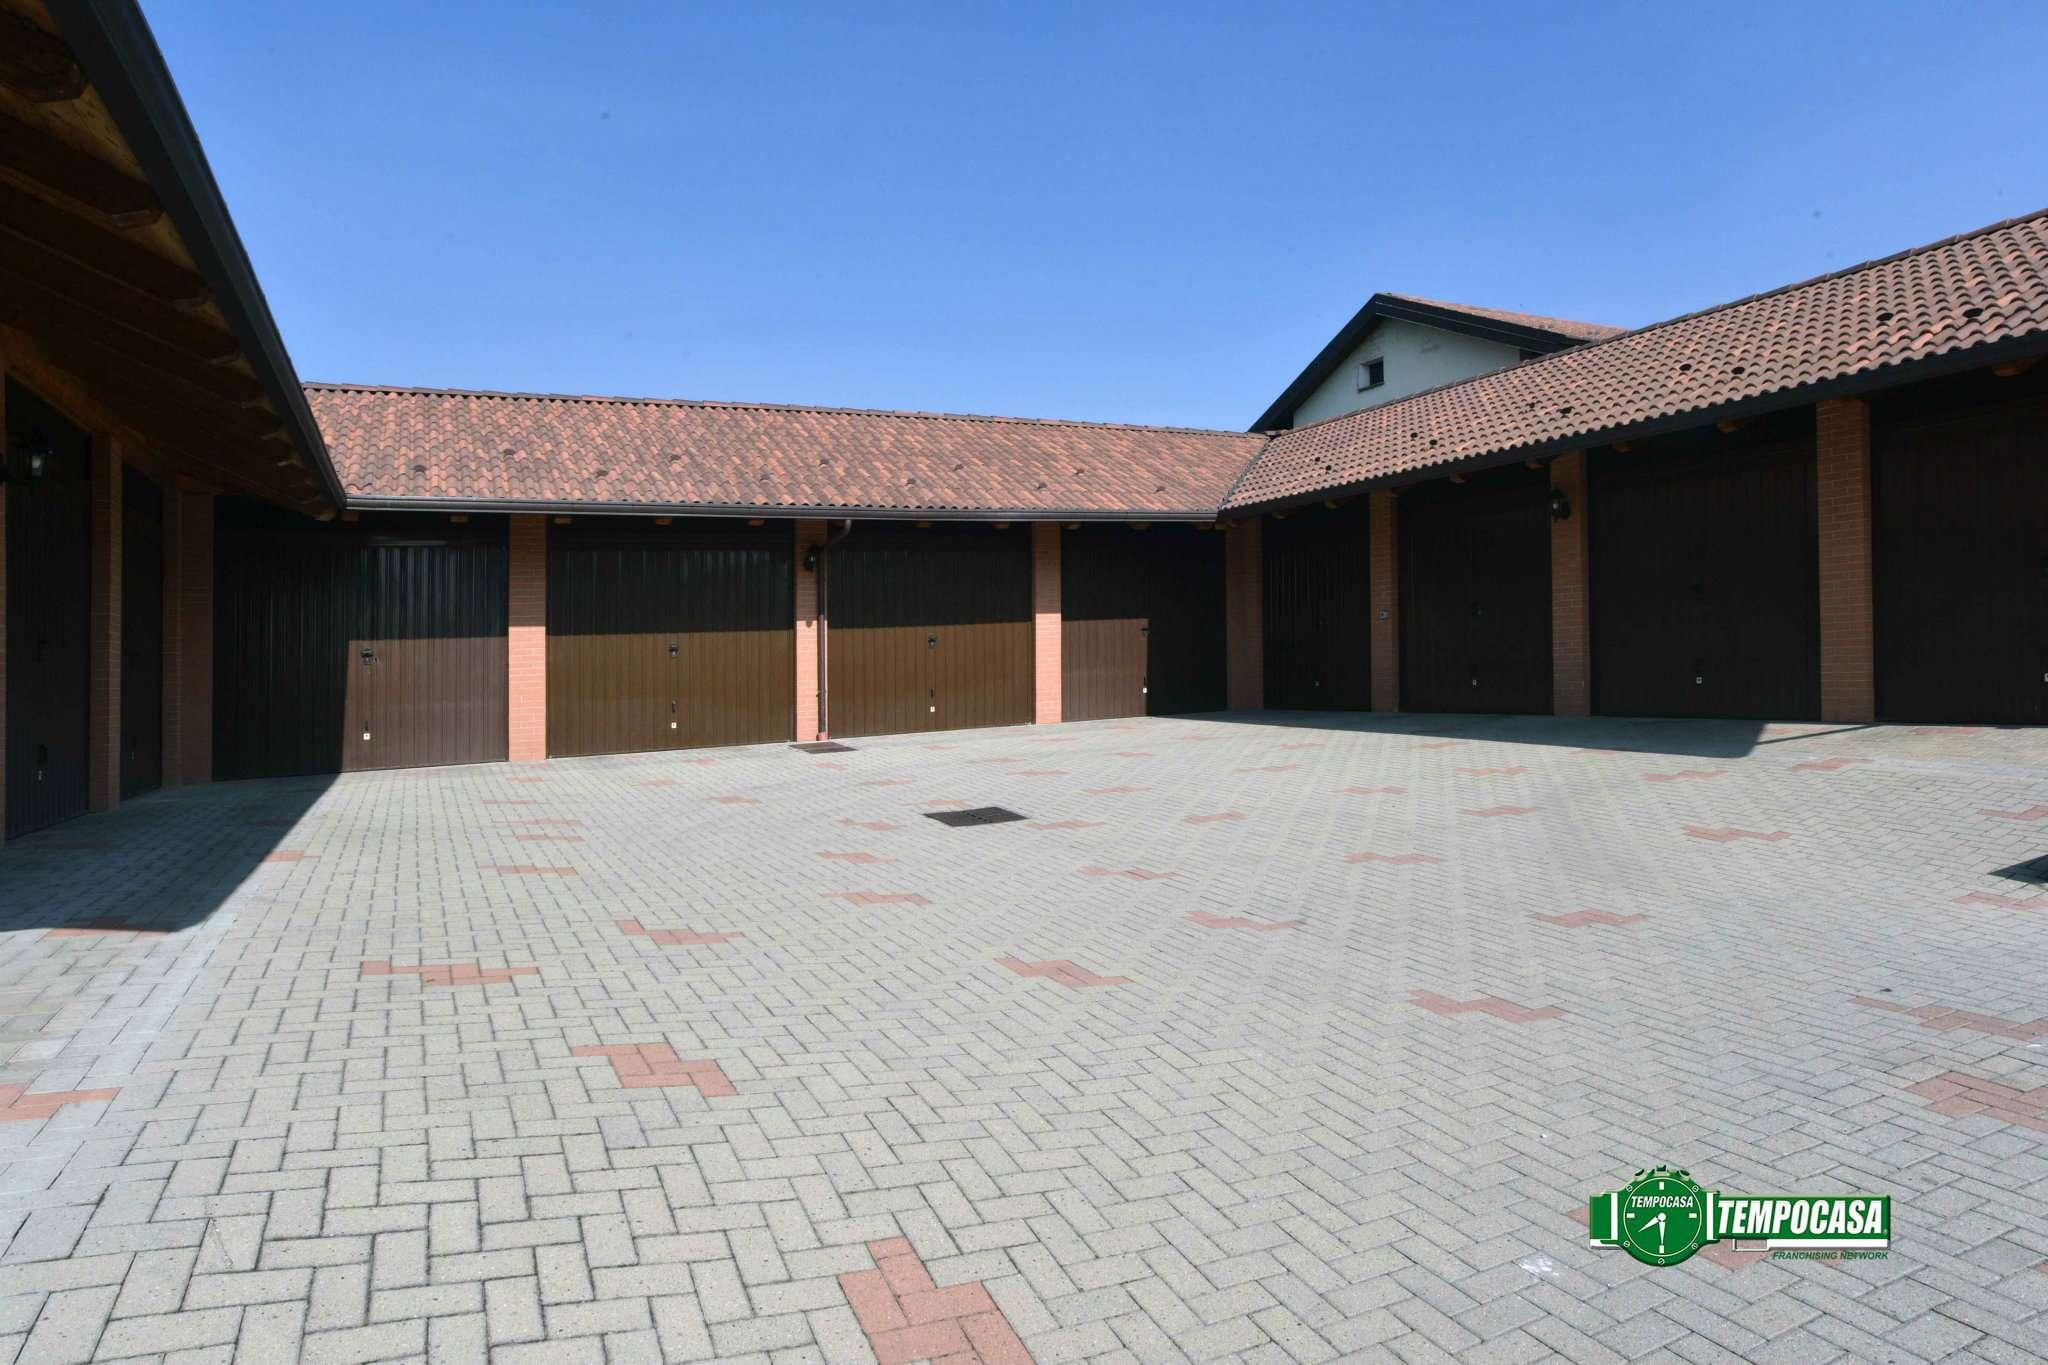 Bilocale Settimo Torinese Via Fornaci 10